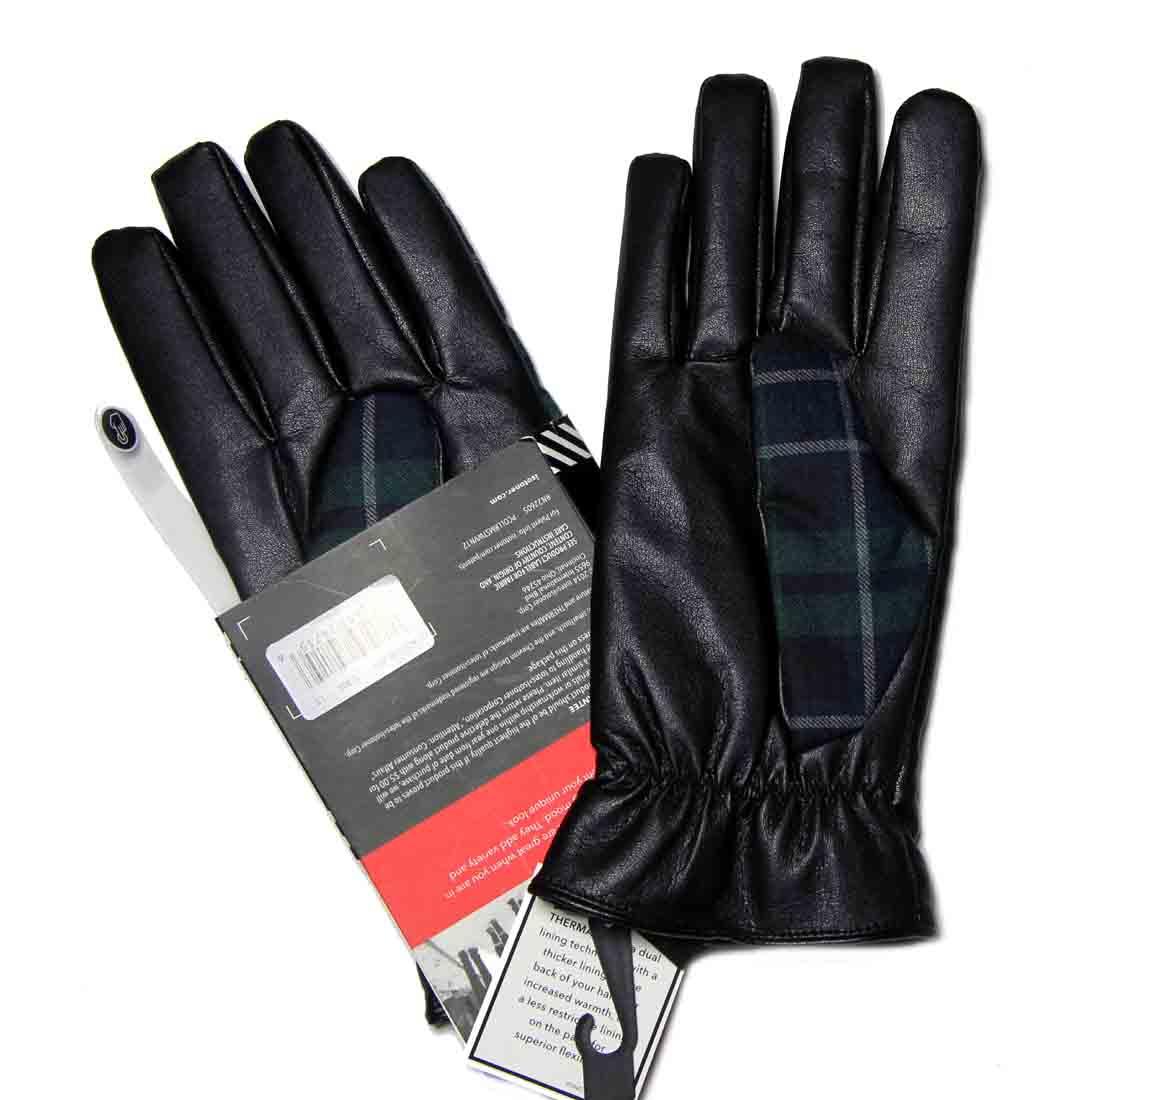 Isotoner Smartouch Gloves Plaid Men's Size Large